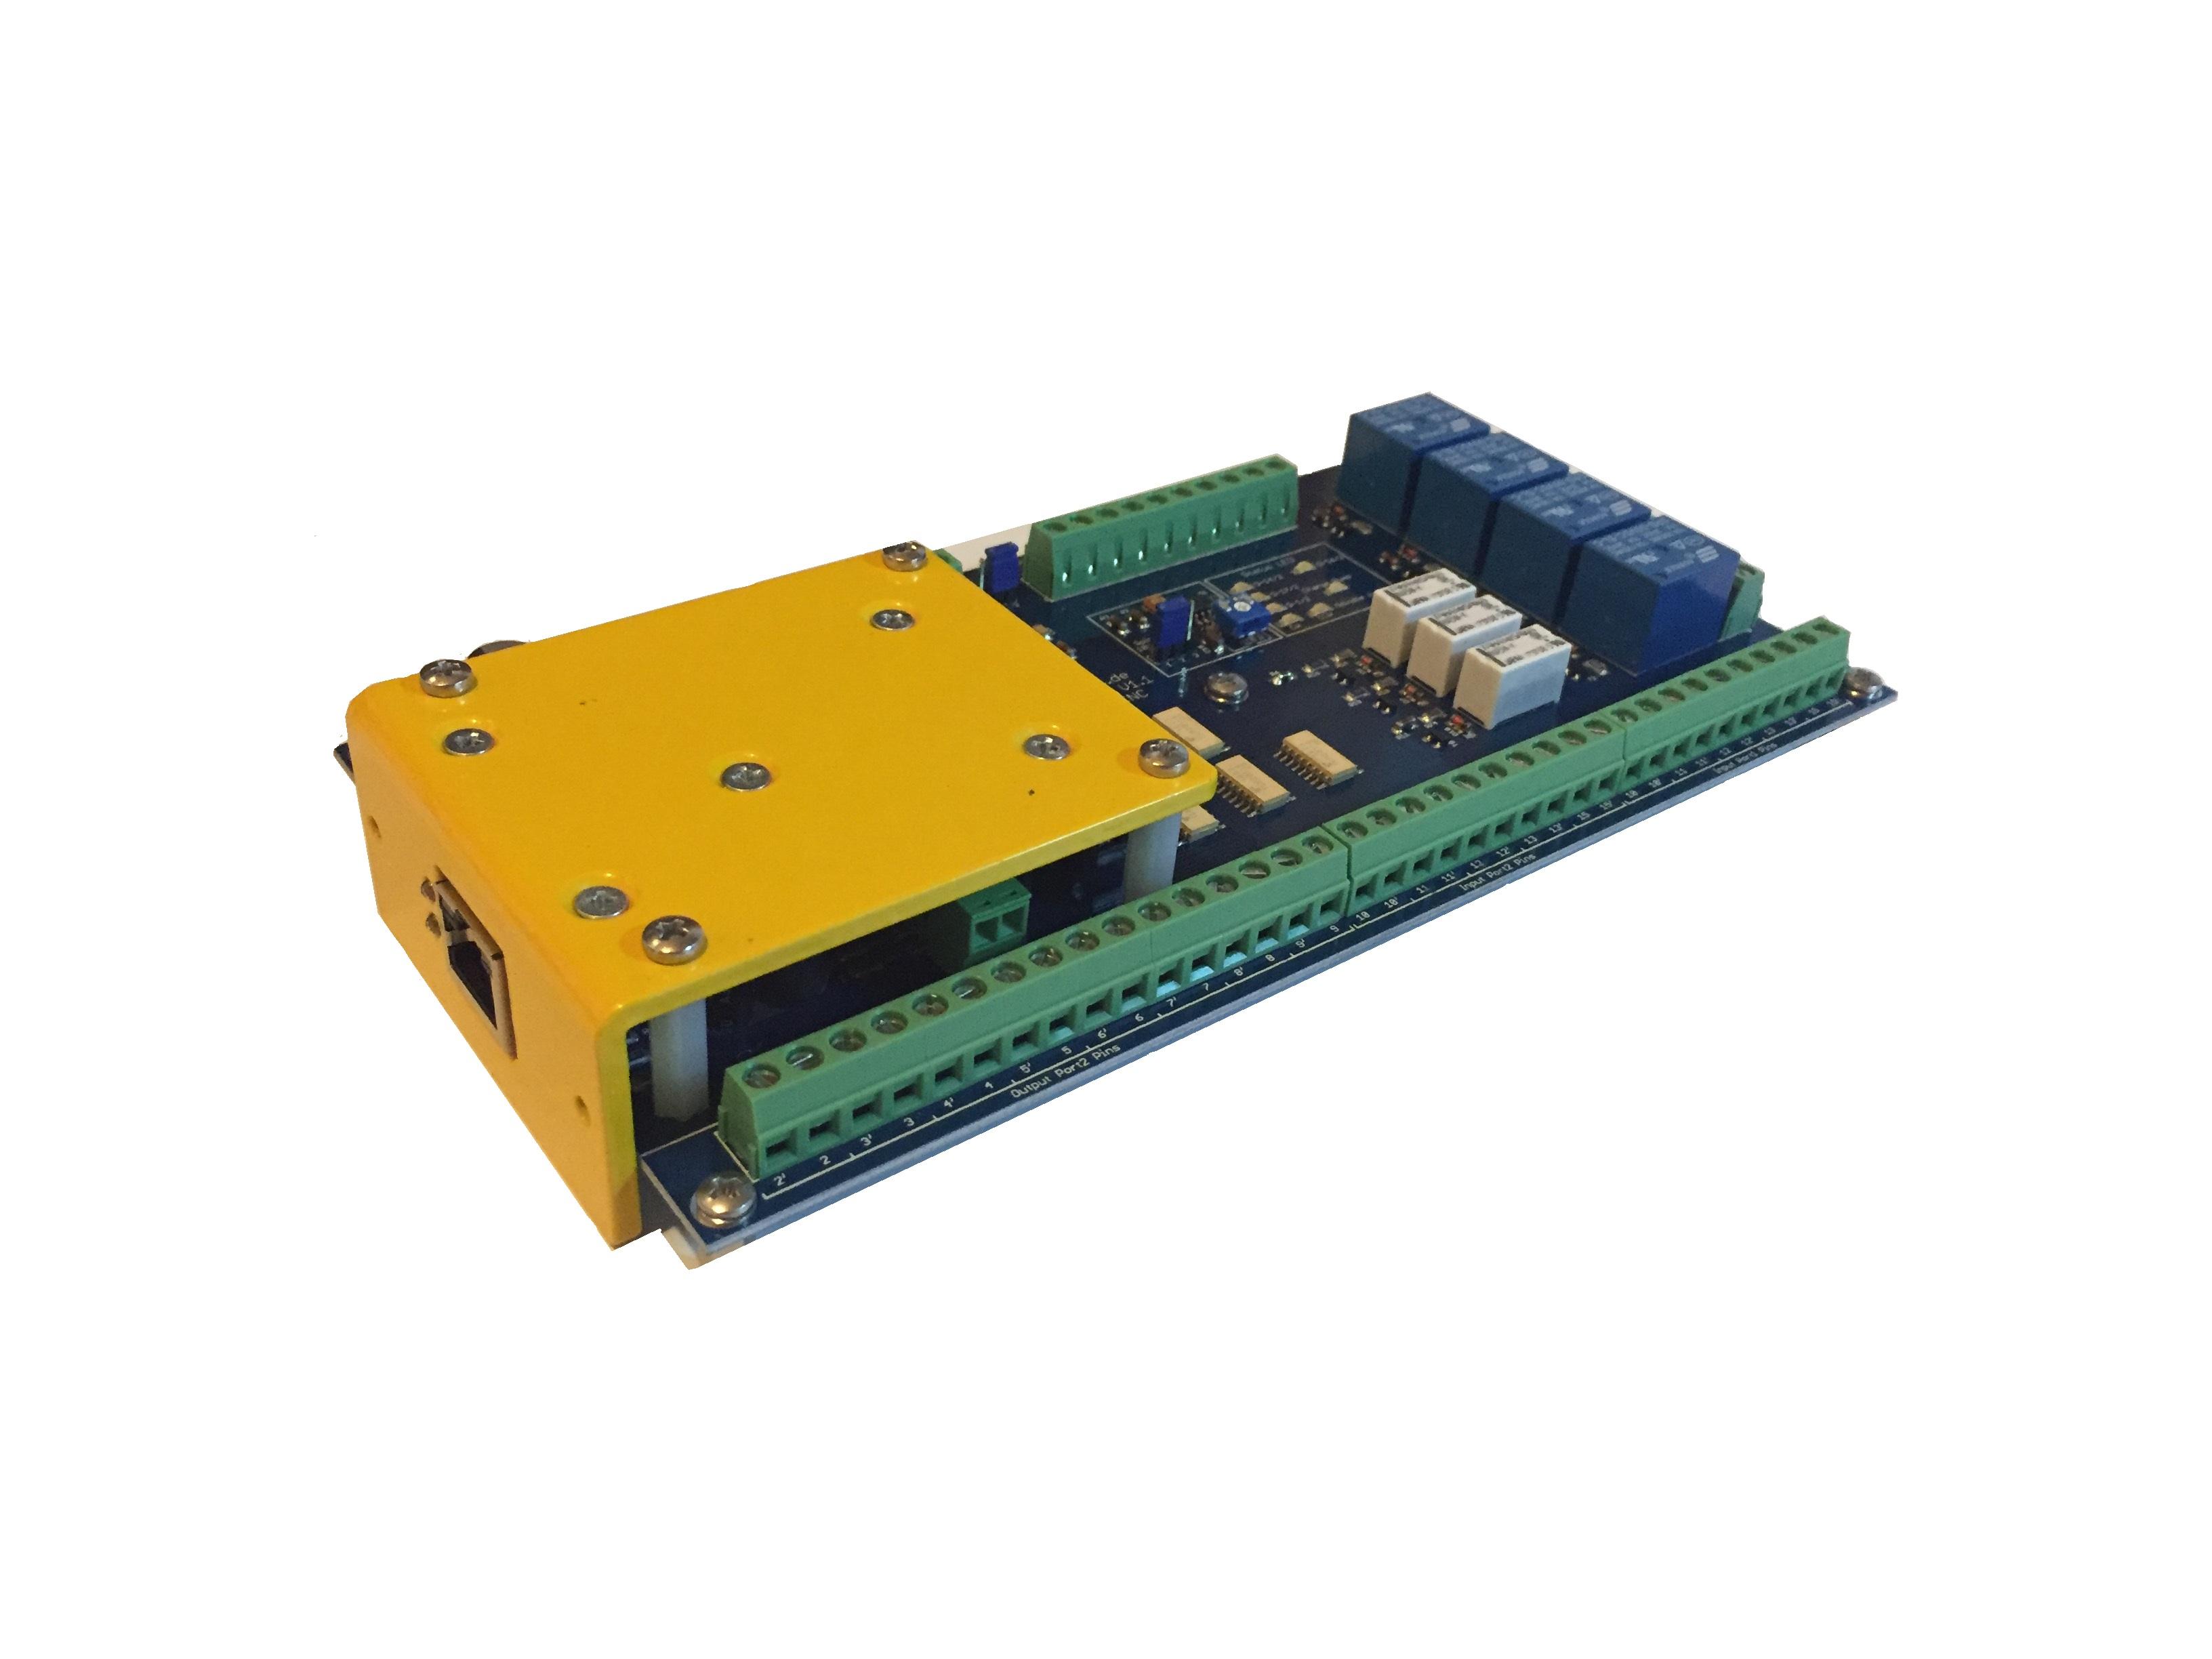 cnc-technics - Breakoutboard for UC400ETH